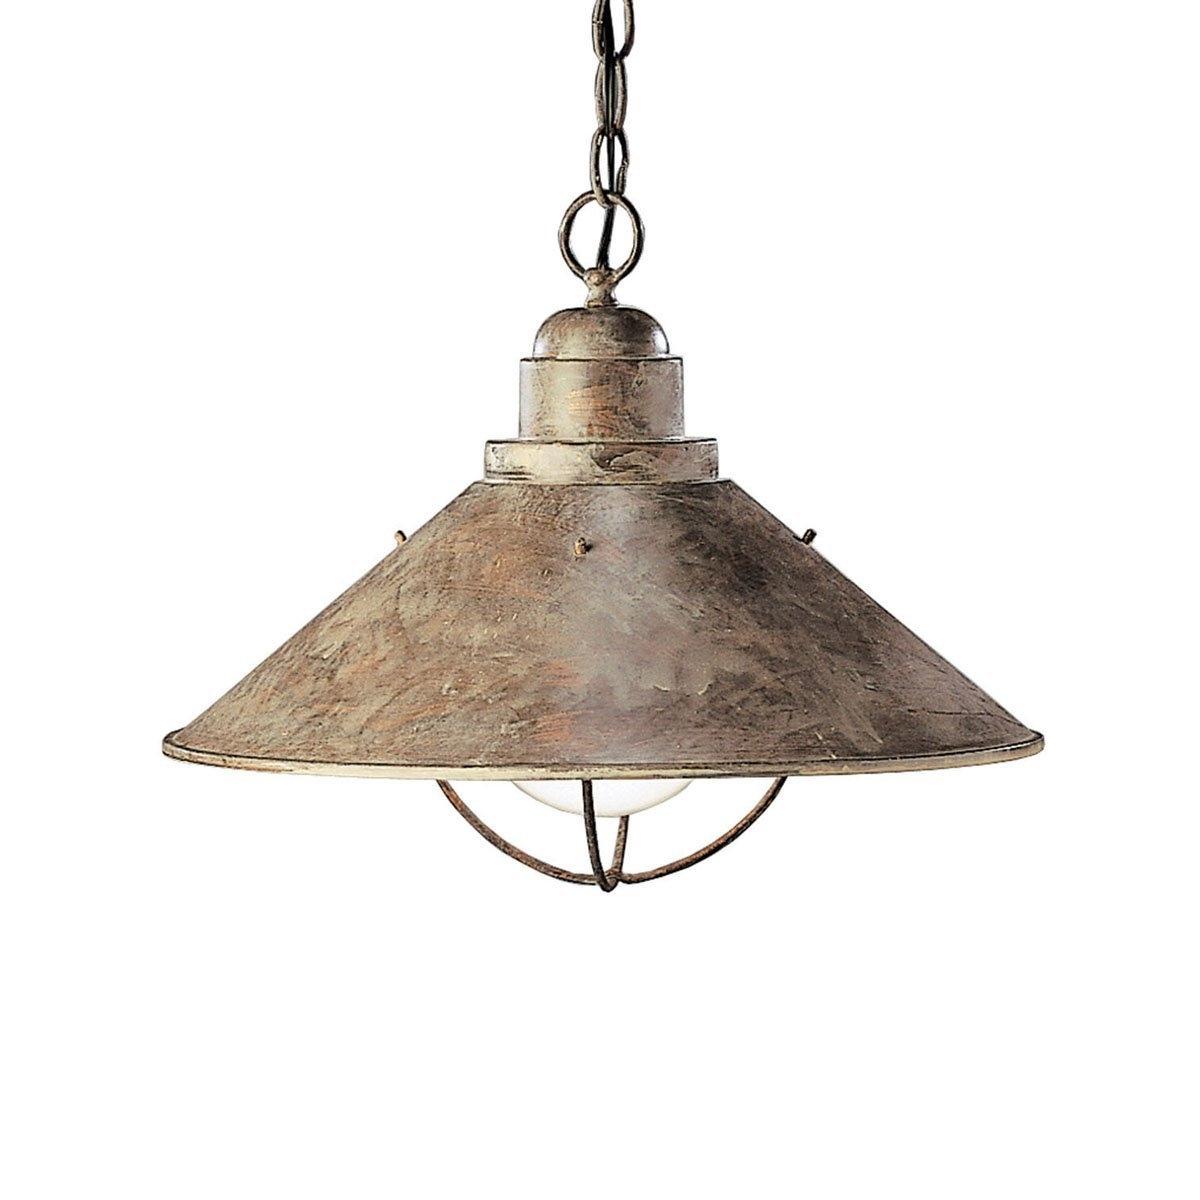 Popular Lighting : Rustic Outdoor Pendant Lighting Kichler 2713ob One Light With Rustic Outdoor Hanging Lights (View 2 of 20)